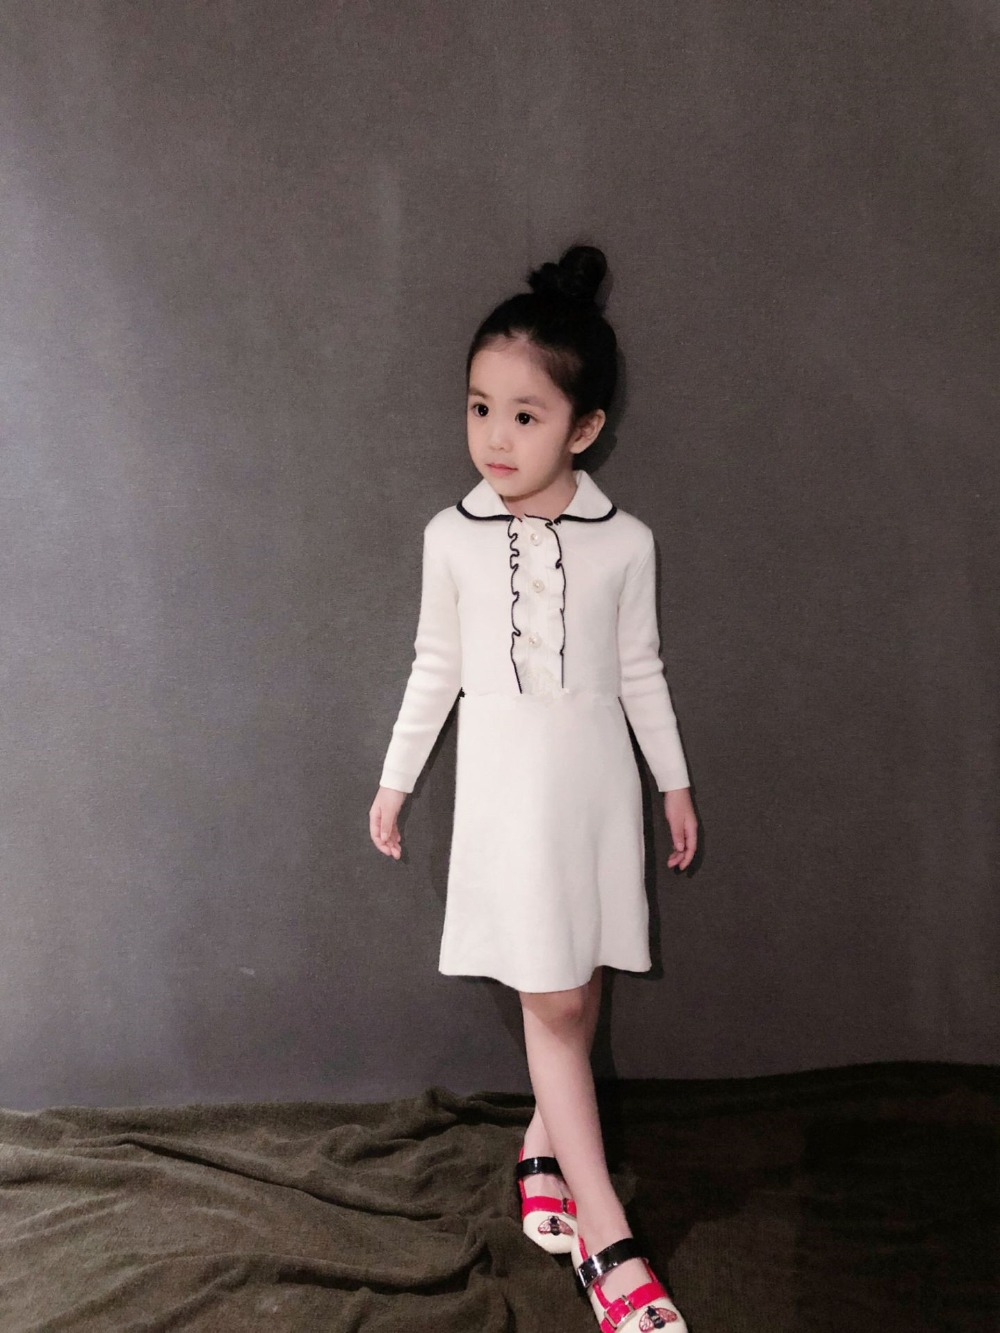 купить Girls long sleeve wool dress 50% merino wool girls princess dress girls costume по цене 3504.93 рублей